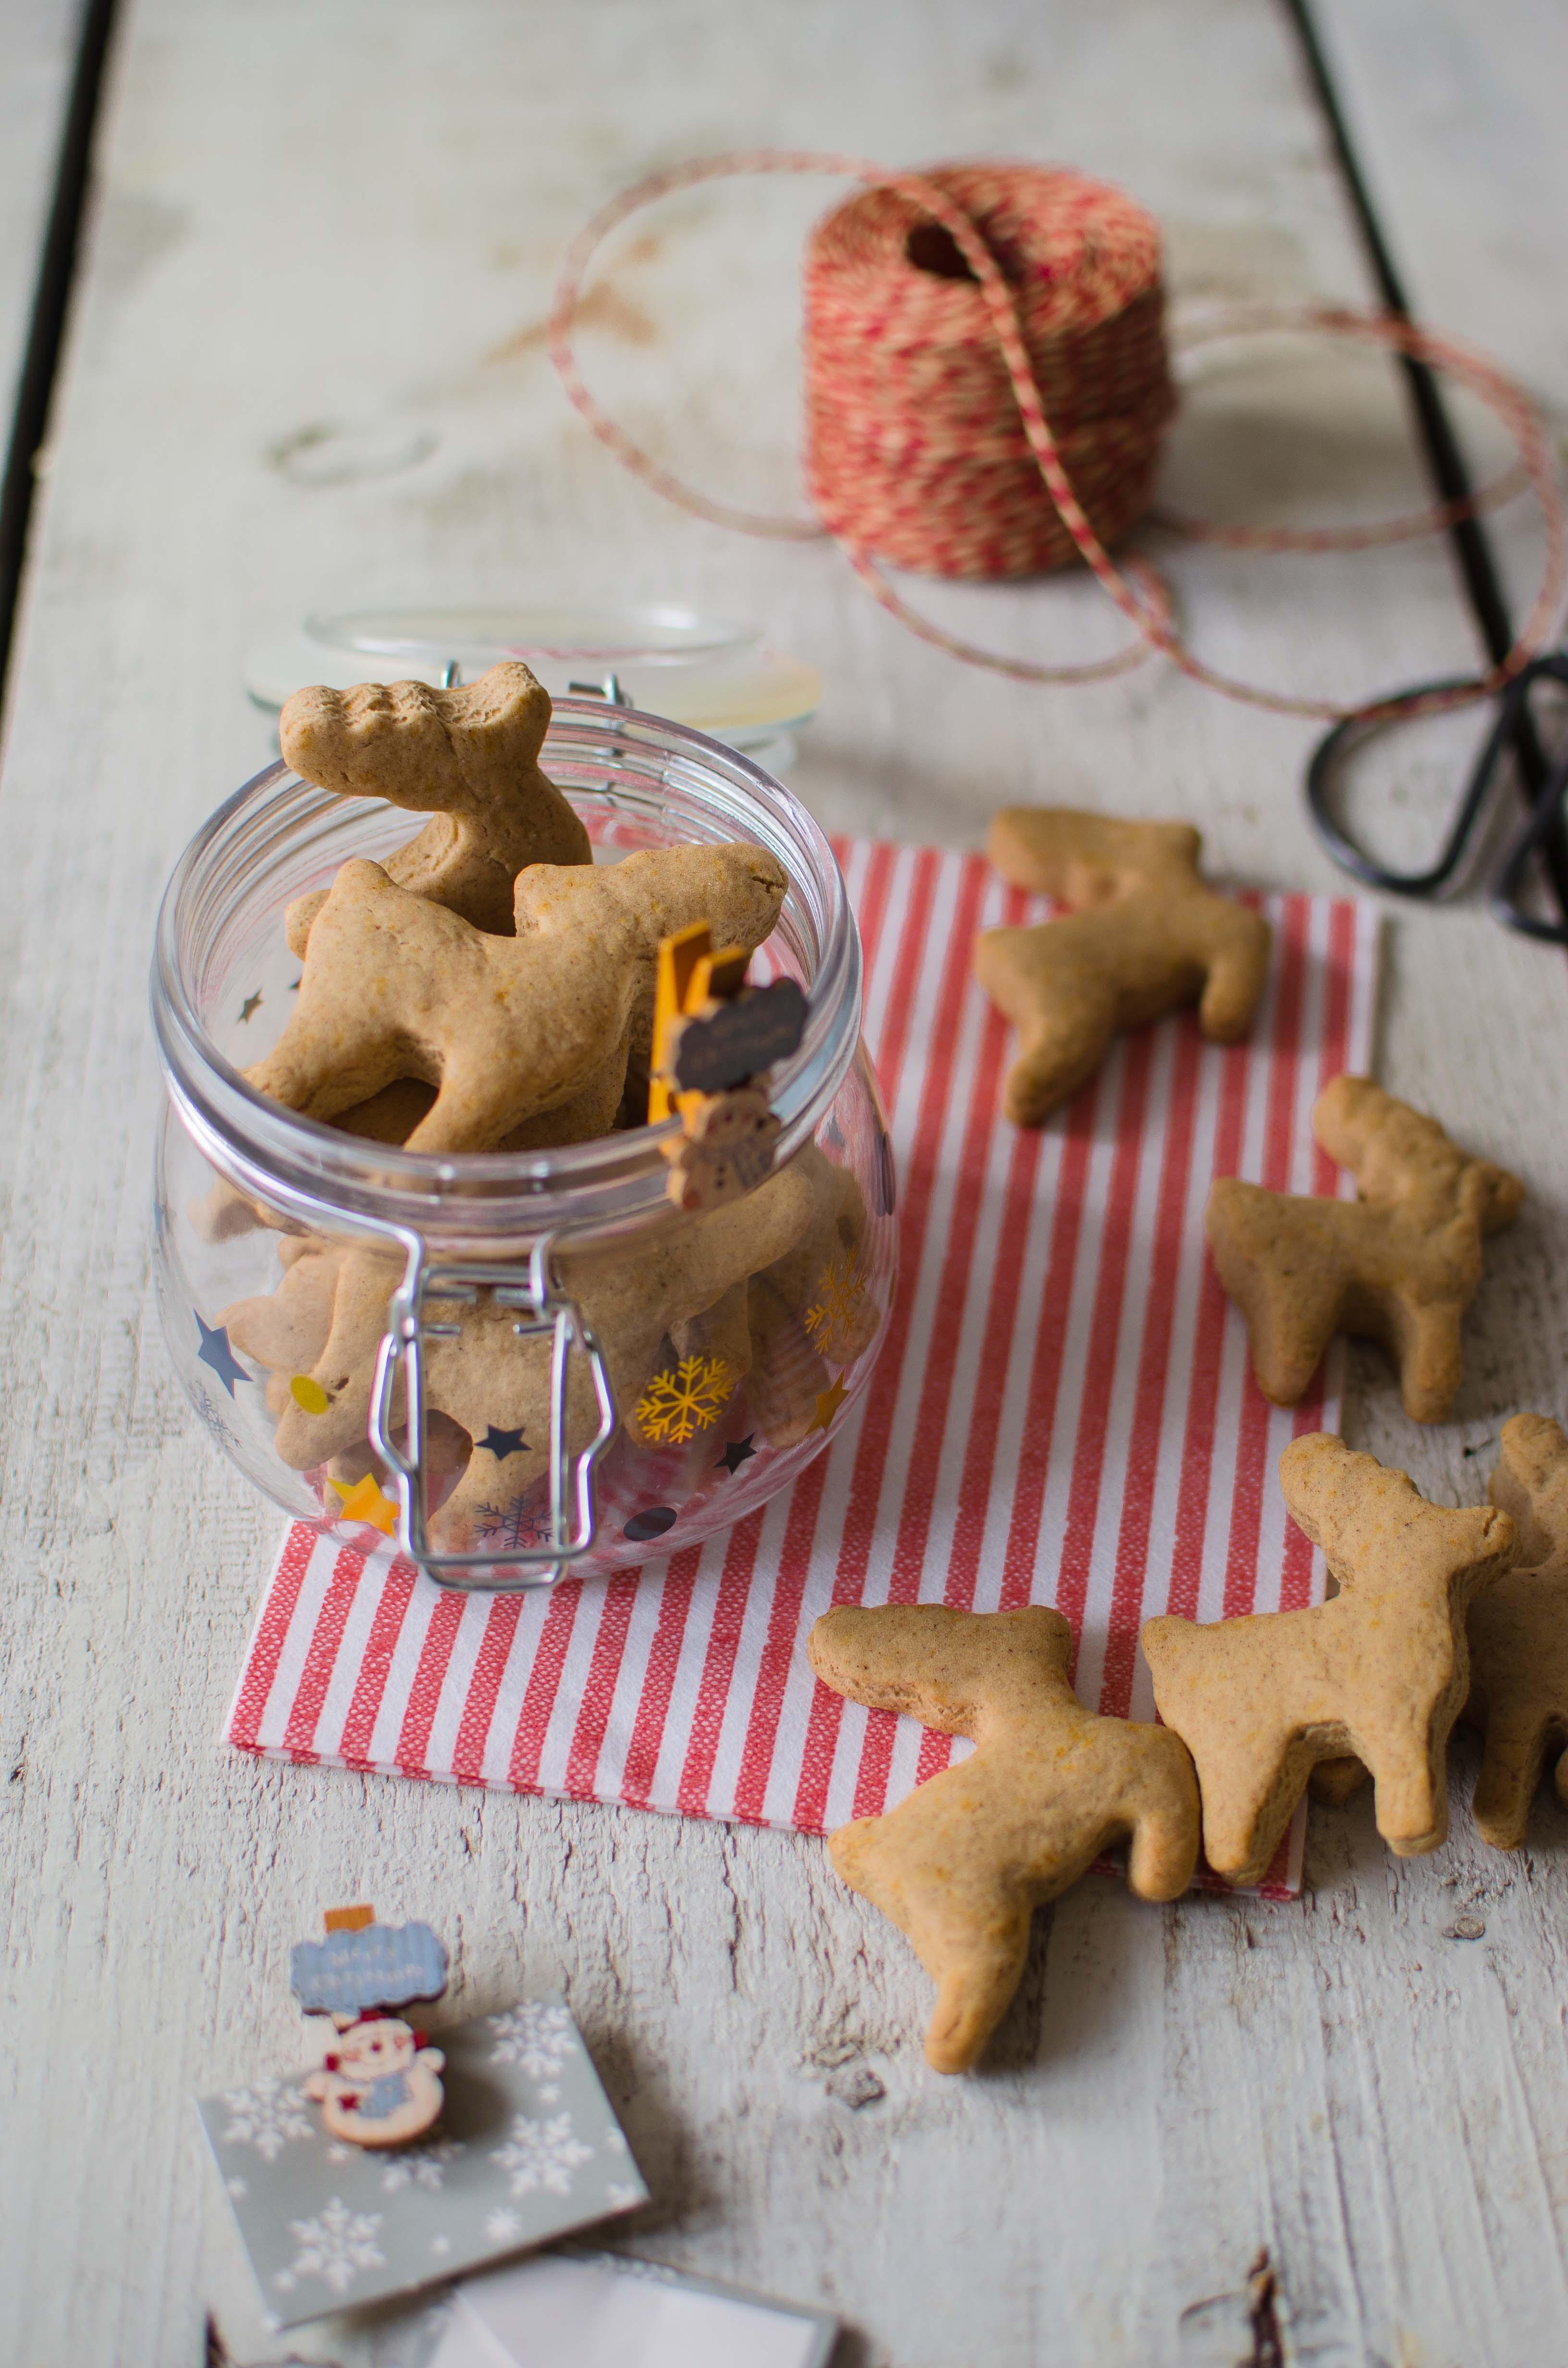 biscotti-svedesi-ikea Pepperkakor, biscotti Natalizi di origine Svedese